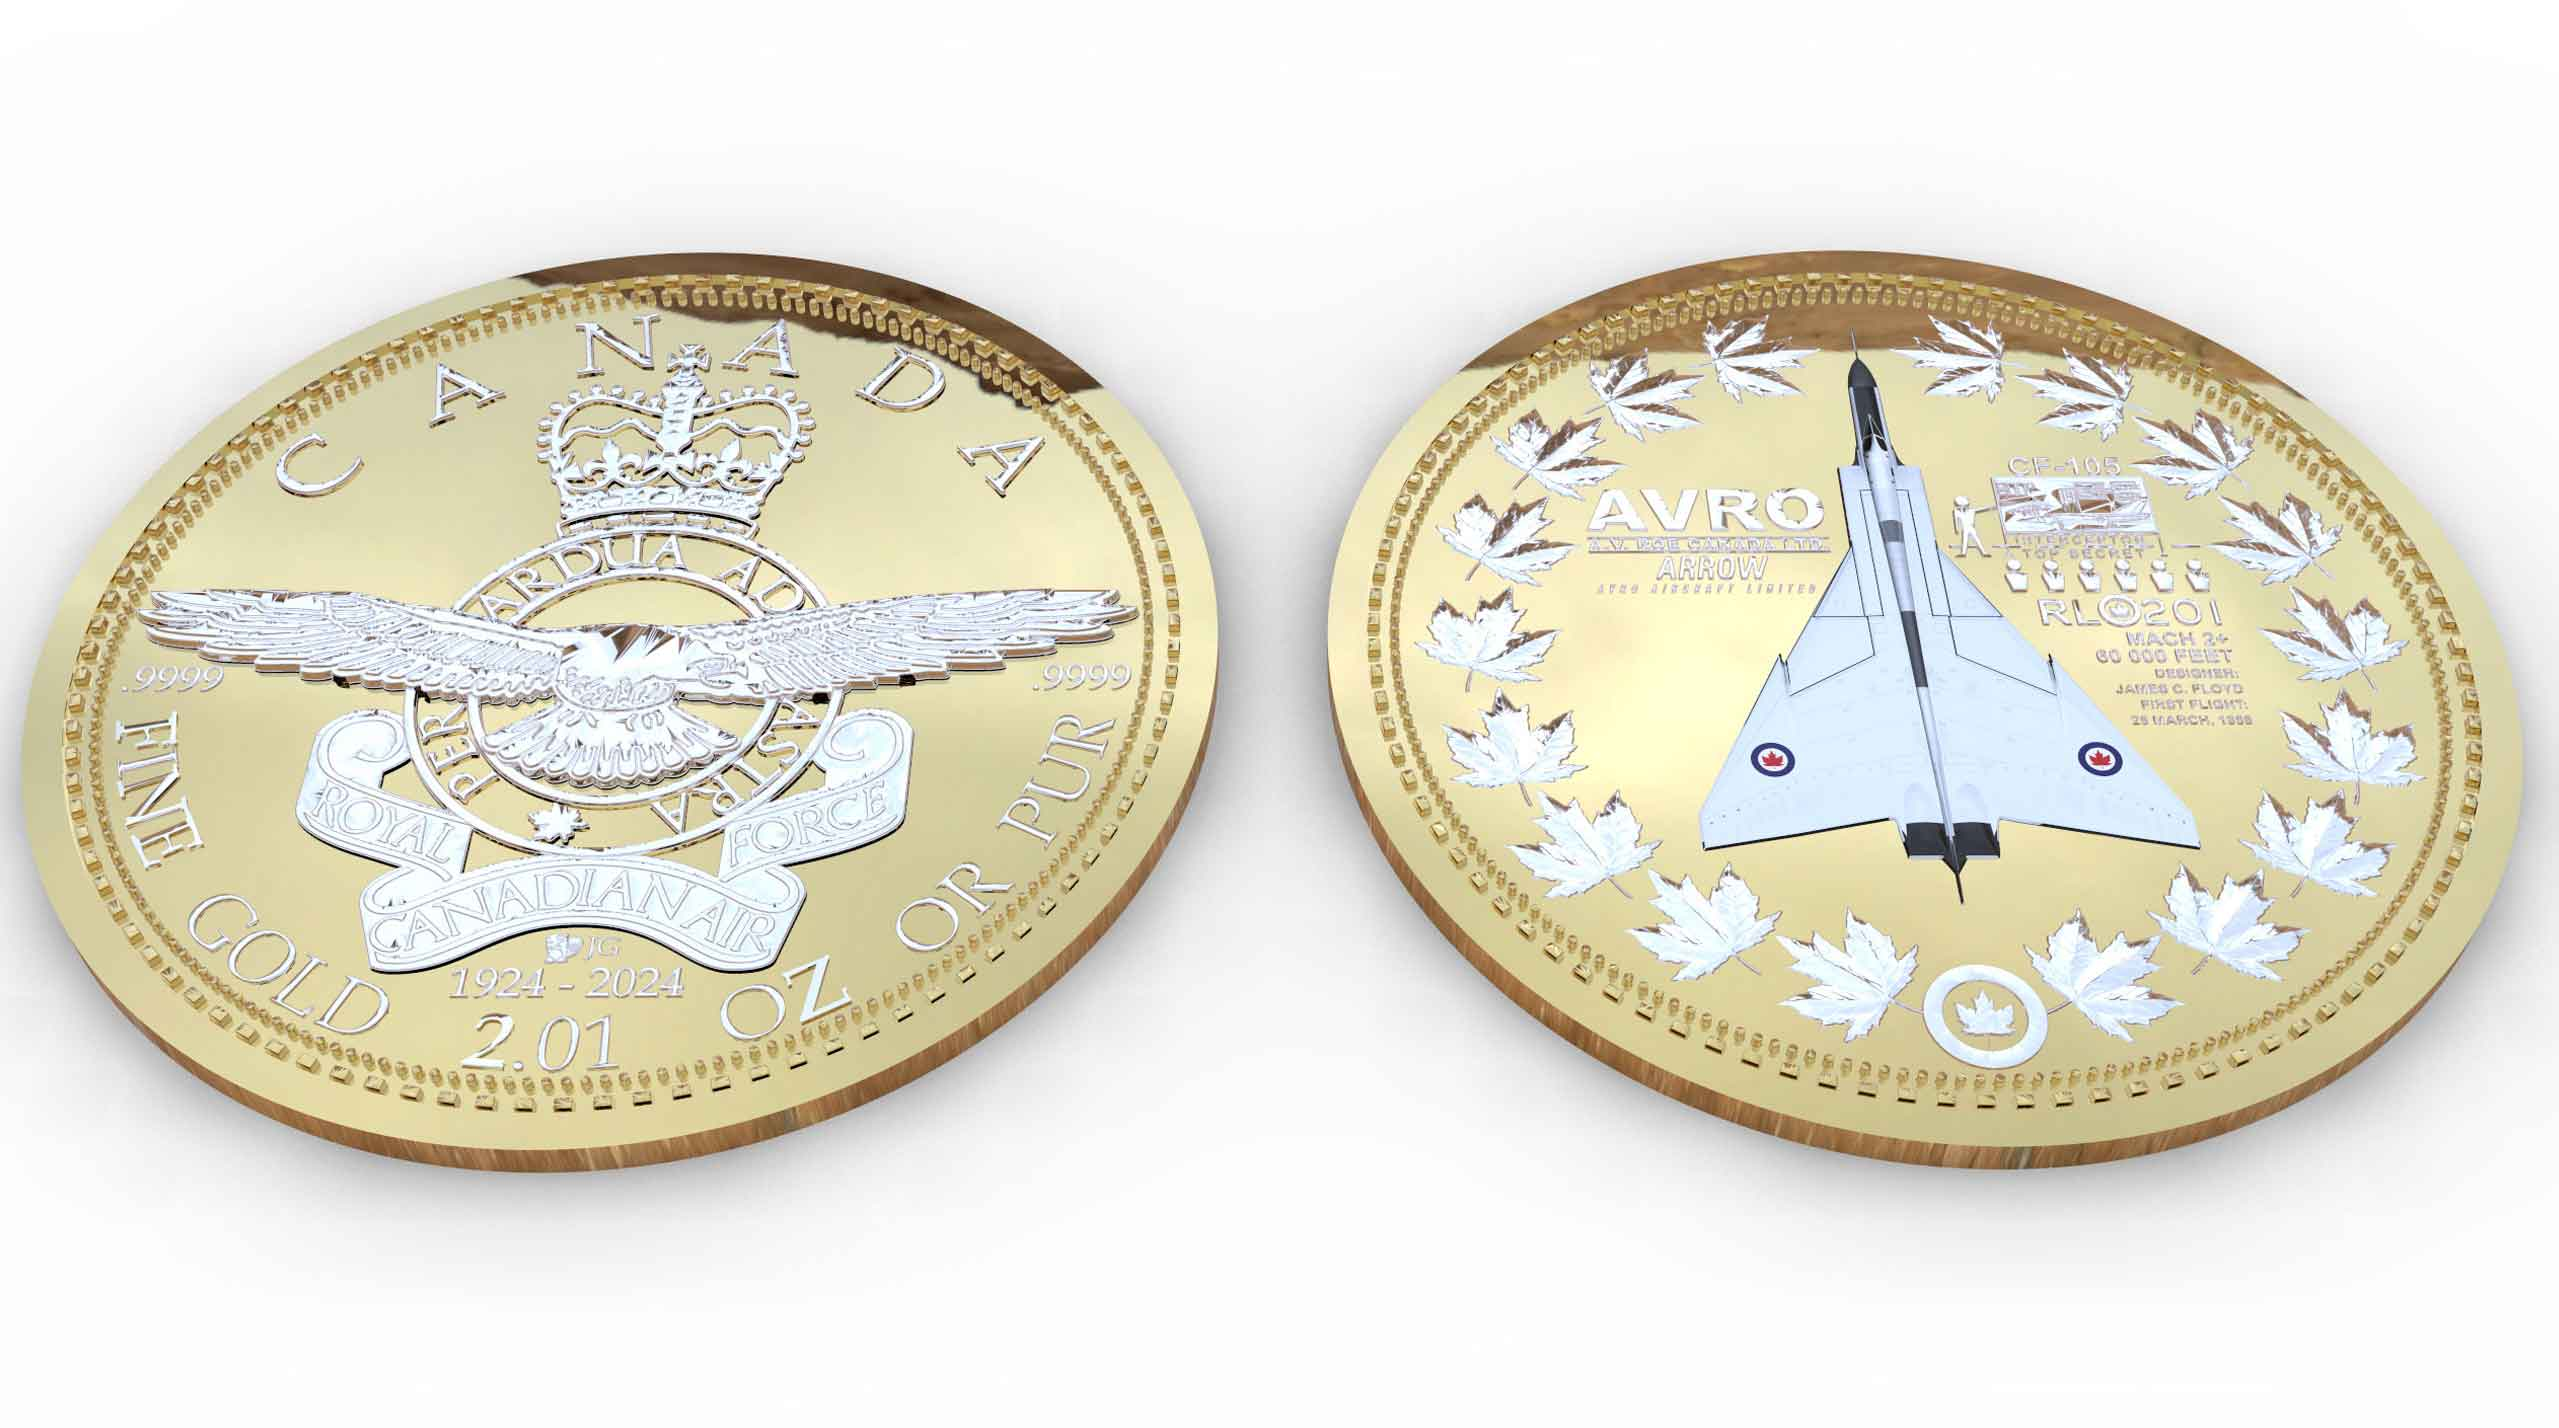 Serial# RL-202 Avro Arrow Gold Coin